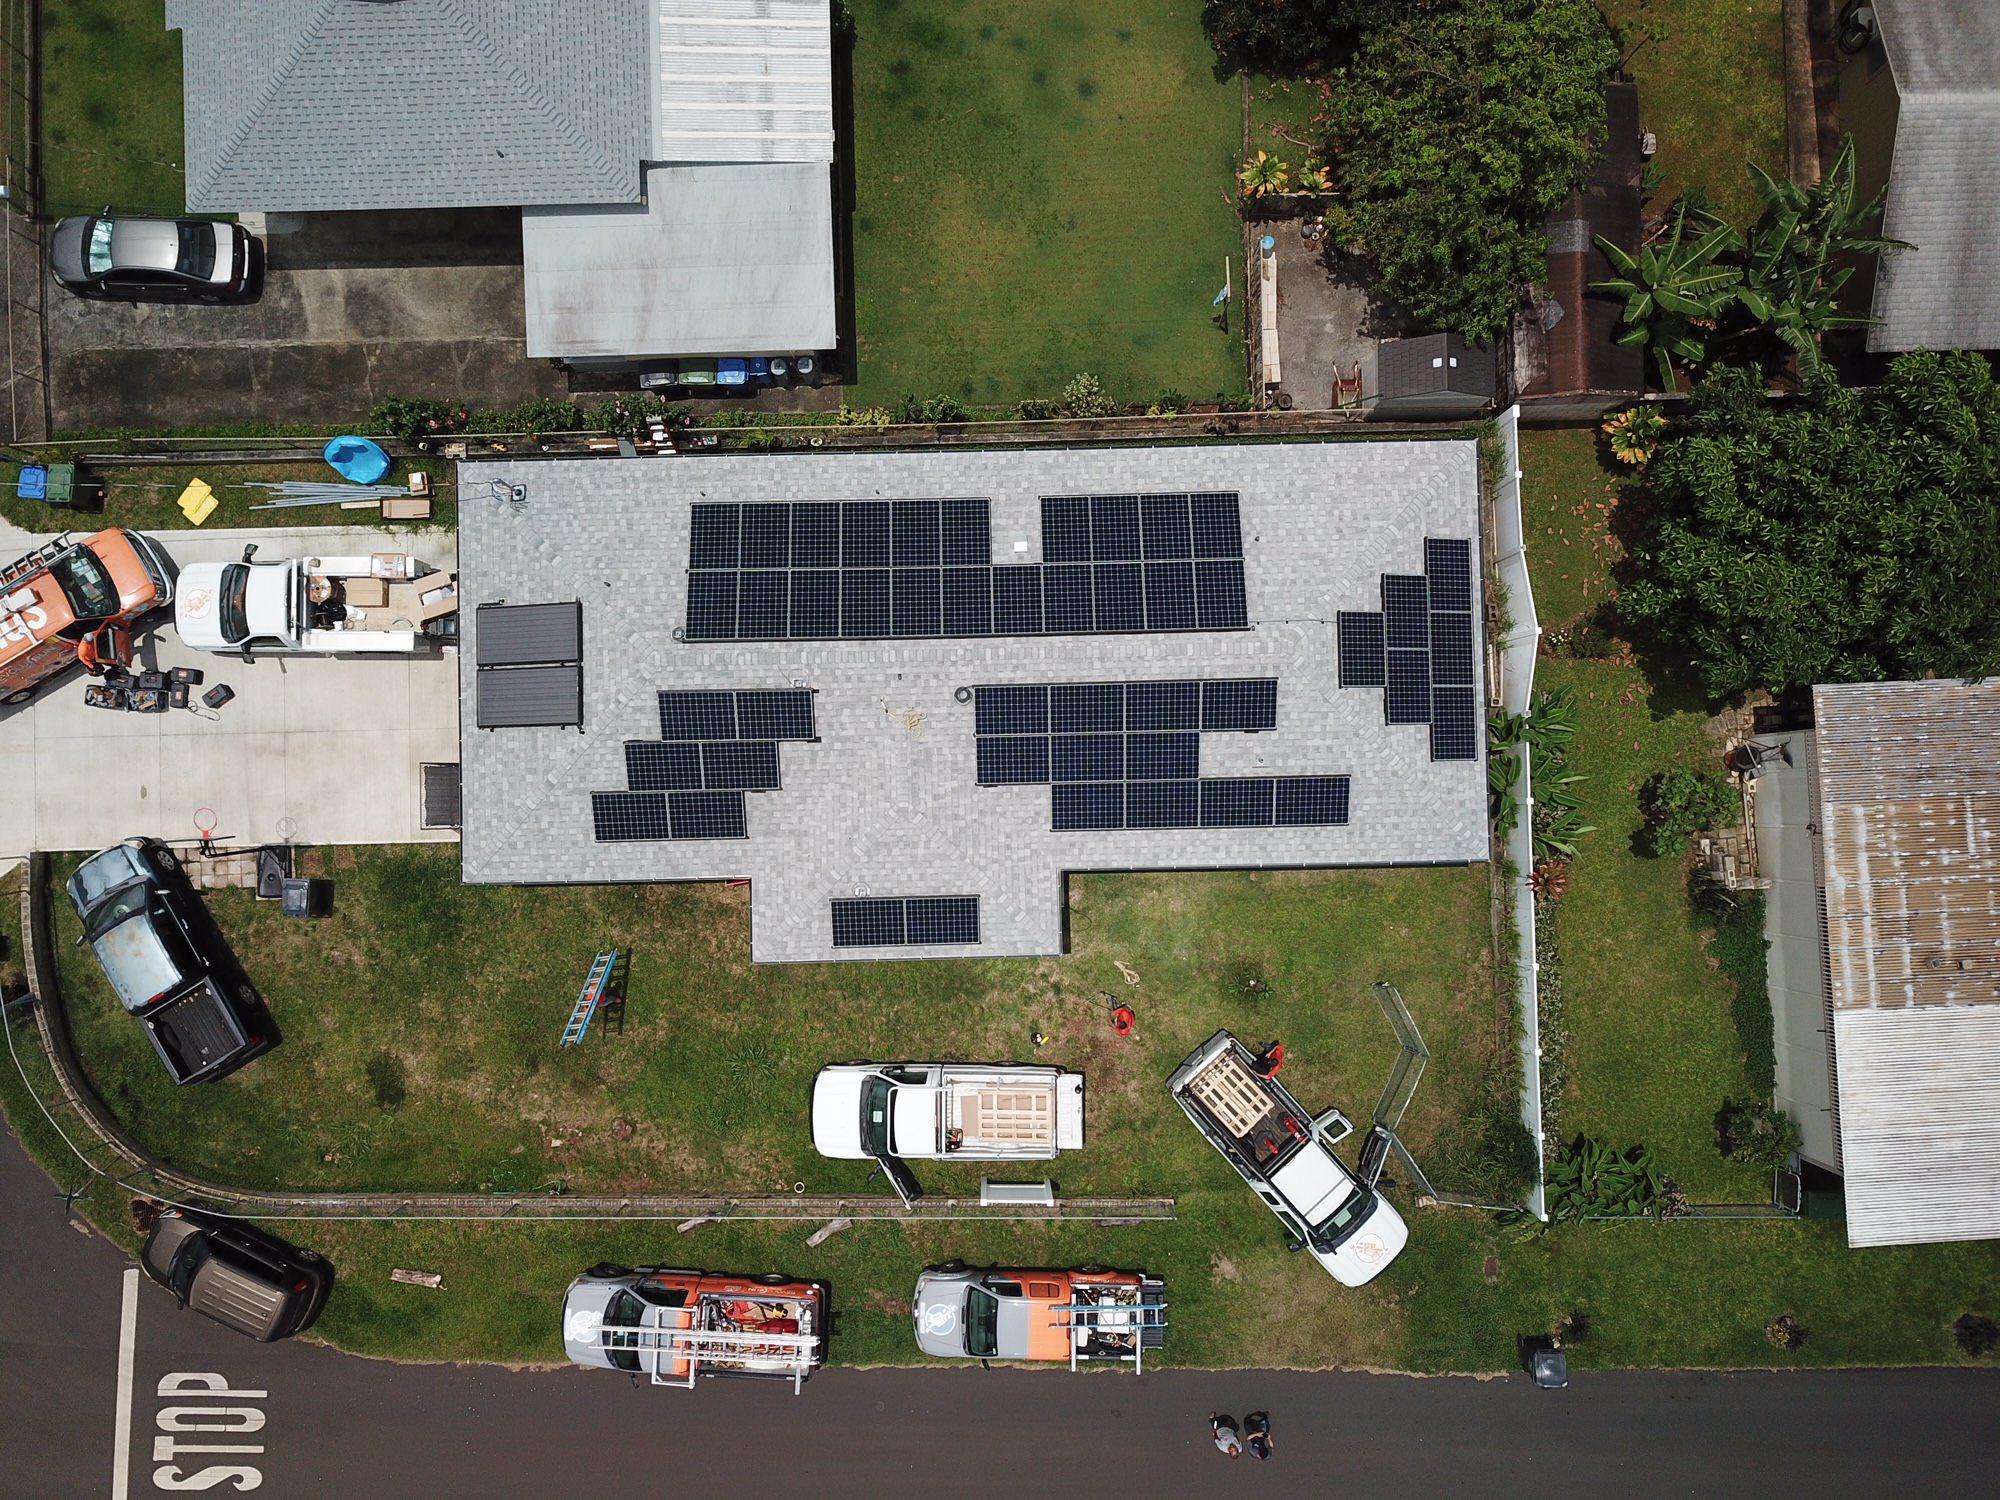 RevoluSun Smart Home Residential Rooftop Solar PV